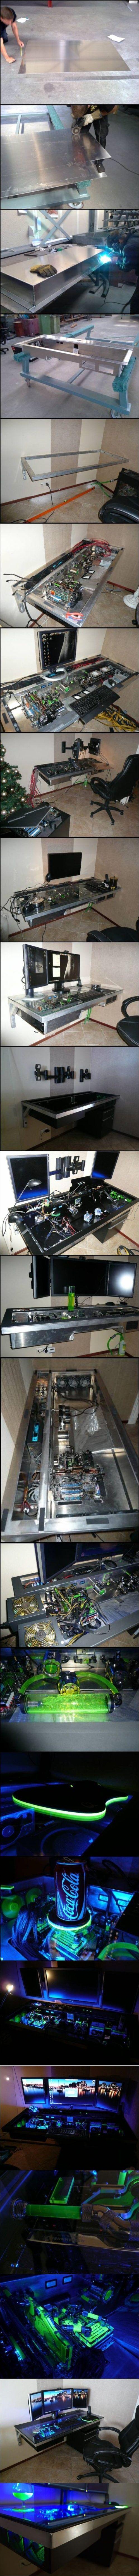 How To : Computer Tisch selber bauen